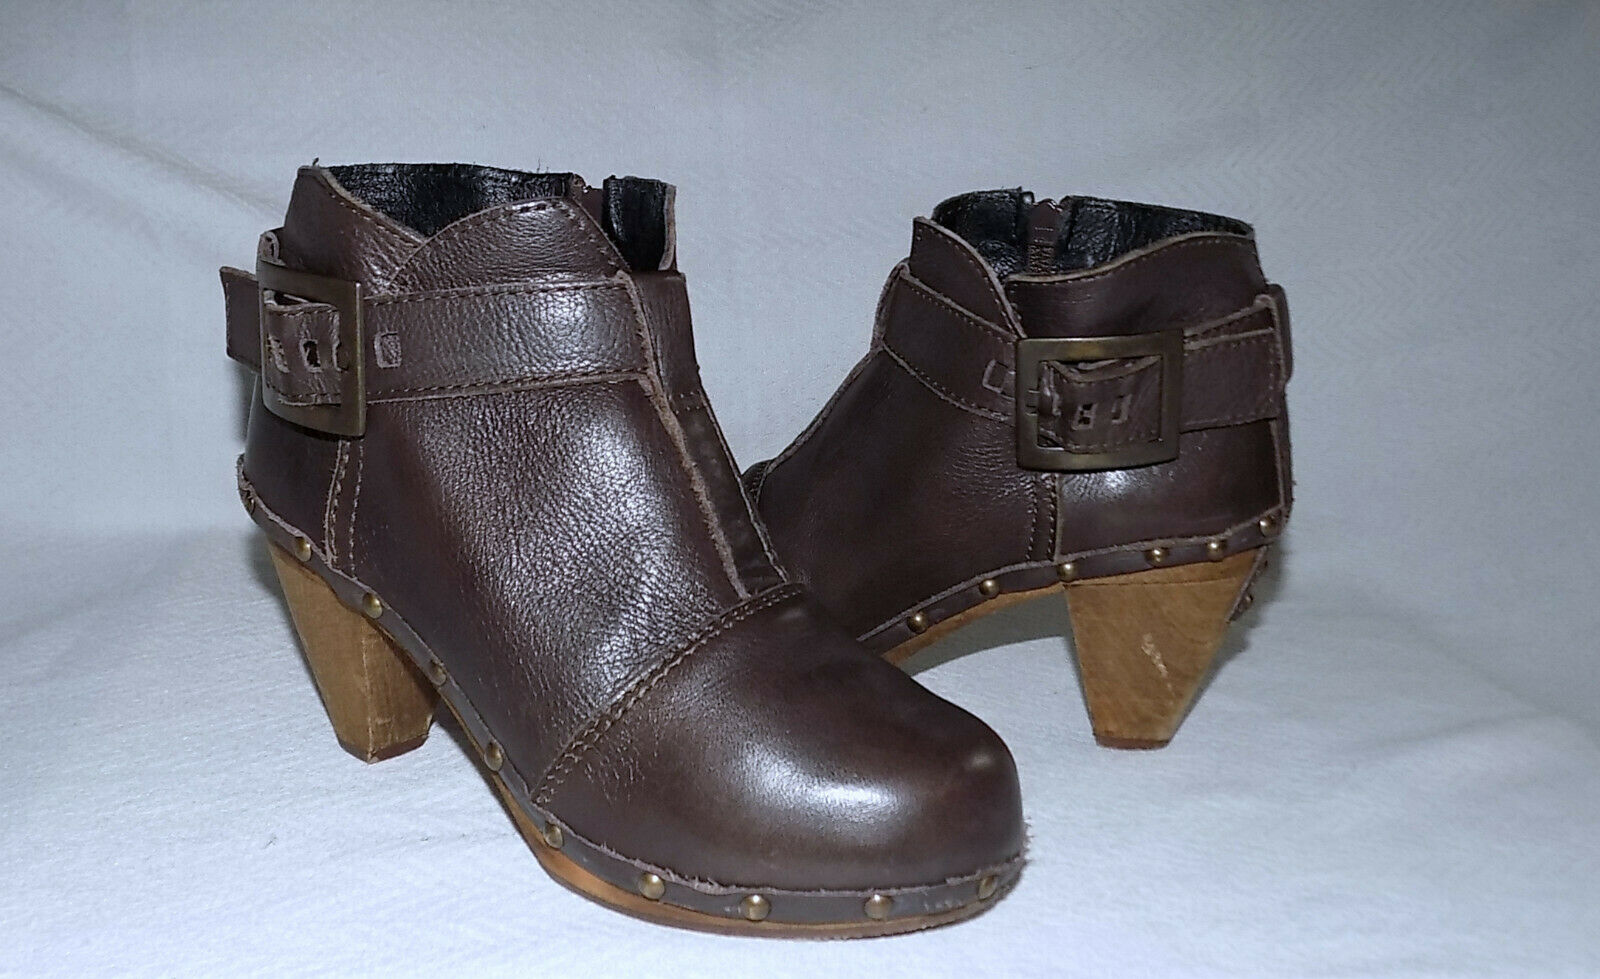 SANITA Denmark Genuine Leather Wood Heeled sole OWL Booties-Size 37 7M Usa-Brown